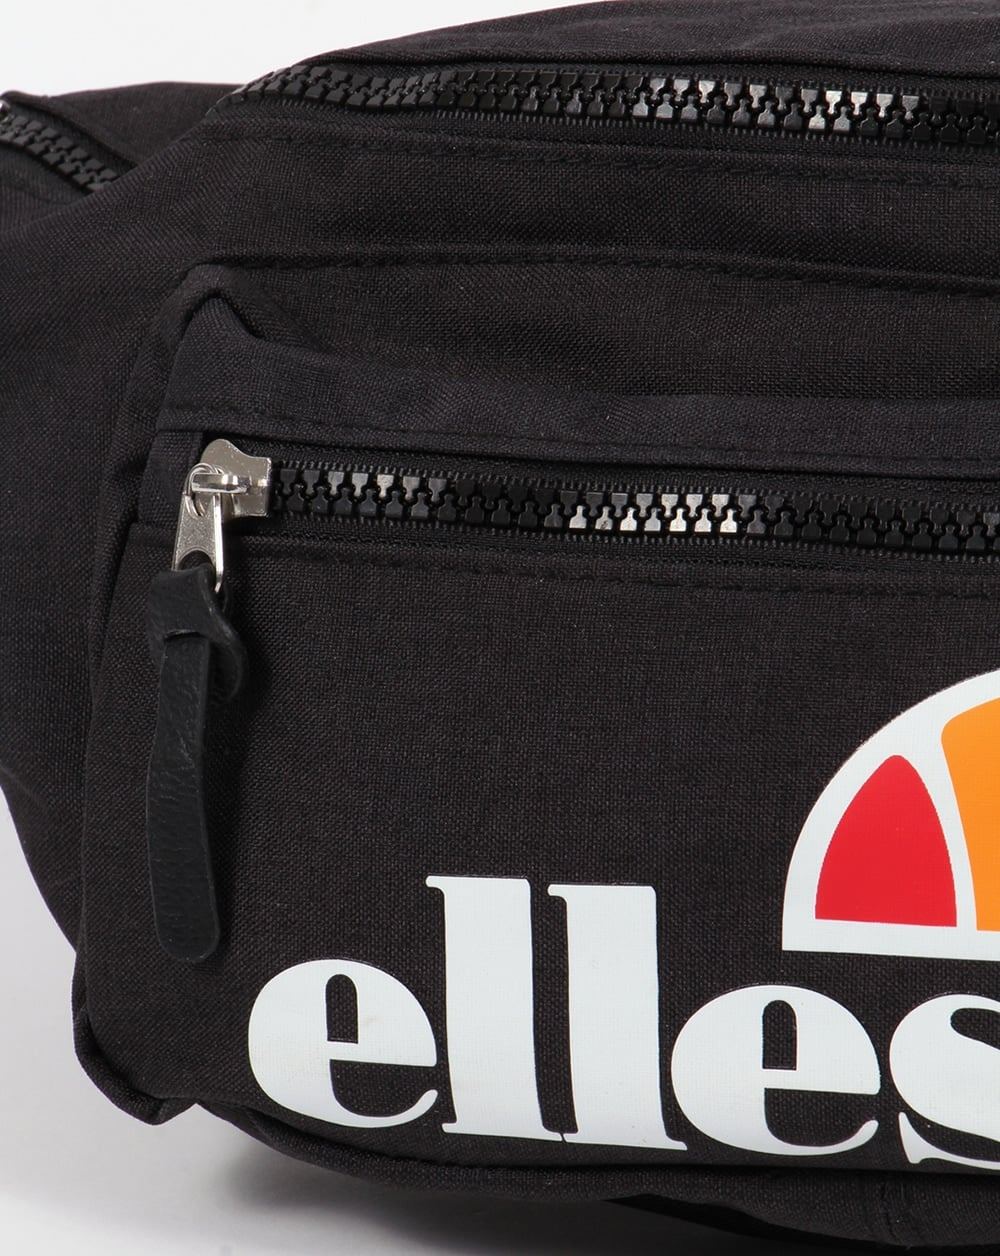 Fila Bum Bag Saleup To 56 Discounts Ready Stock Waist Zipper On